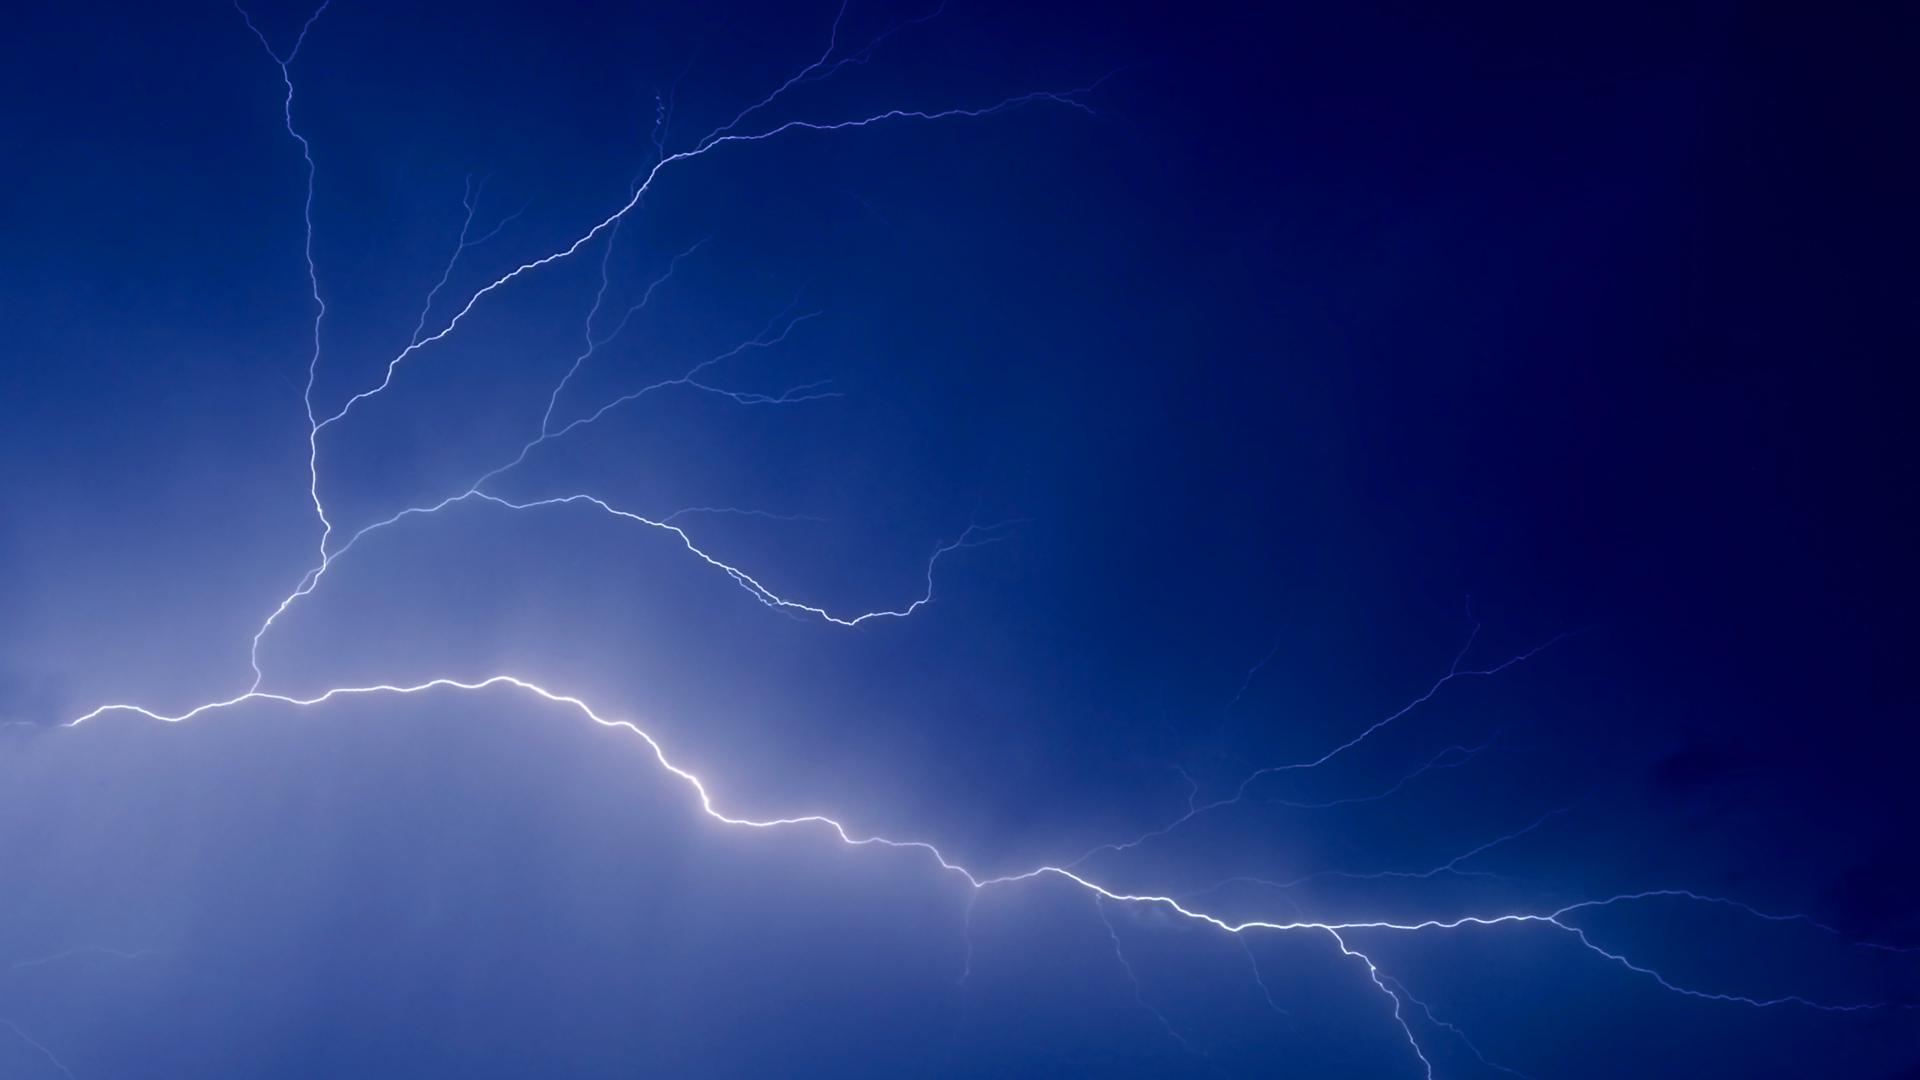 Lightning Backgrounds - WallpaperSafari